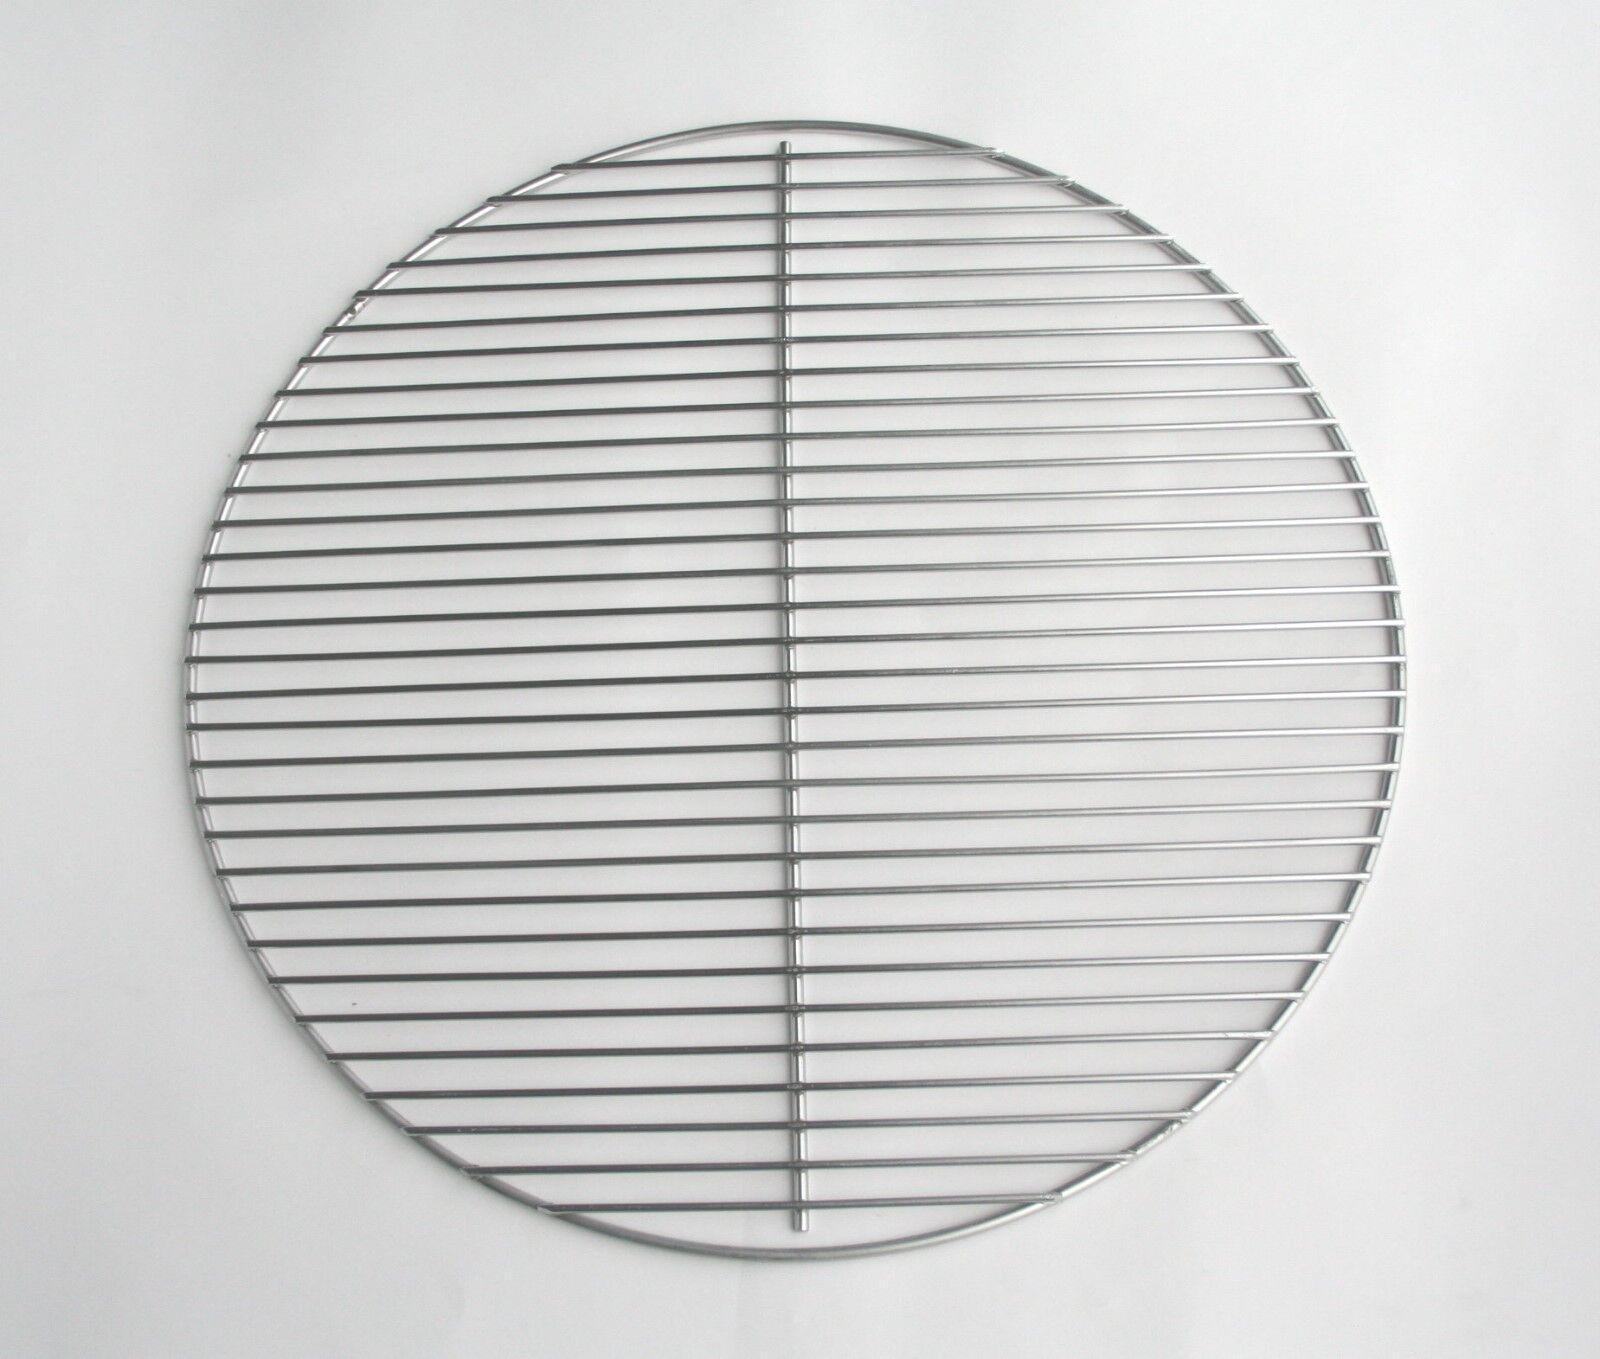 Ø 54,5 cm Edelstahl poliert Grillgitter Grillrost flach rund Grill auch Weber 57